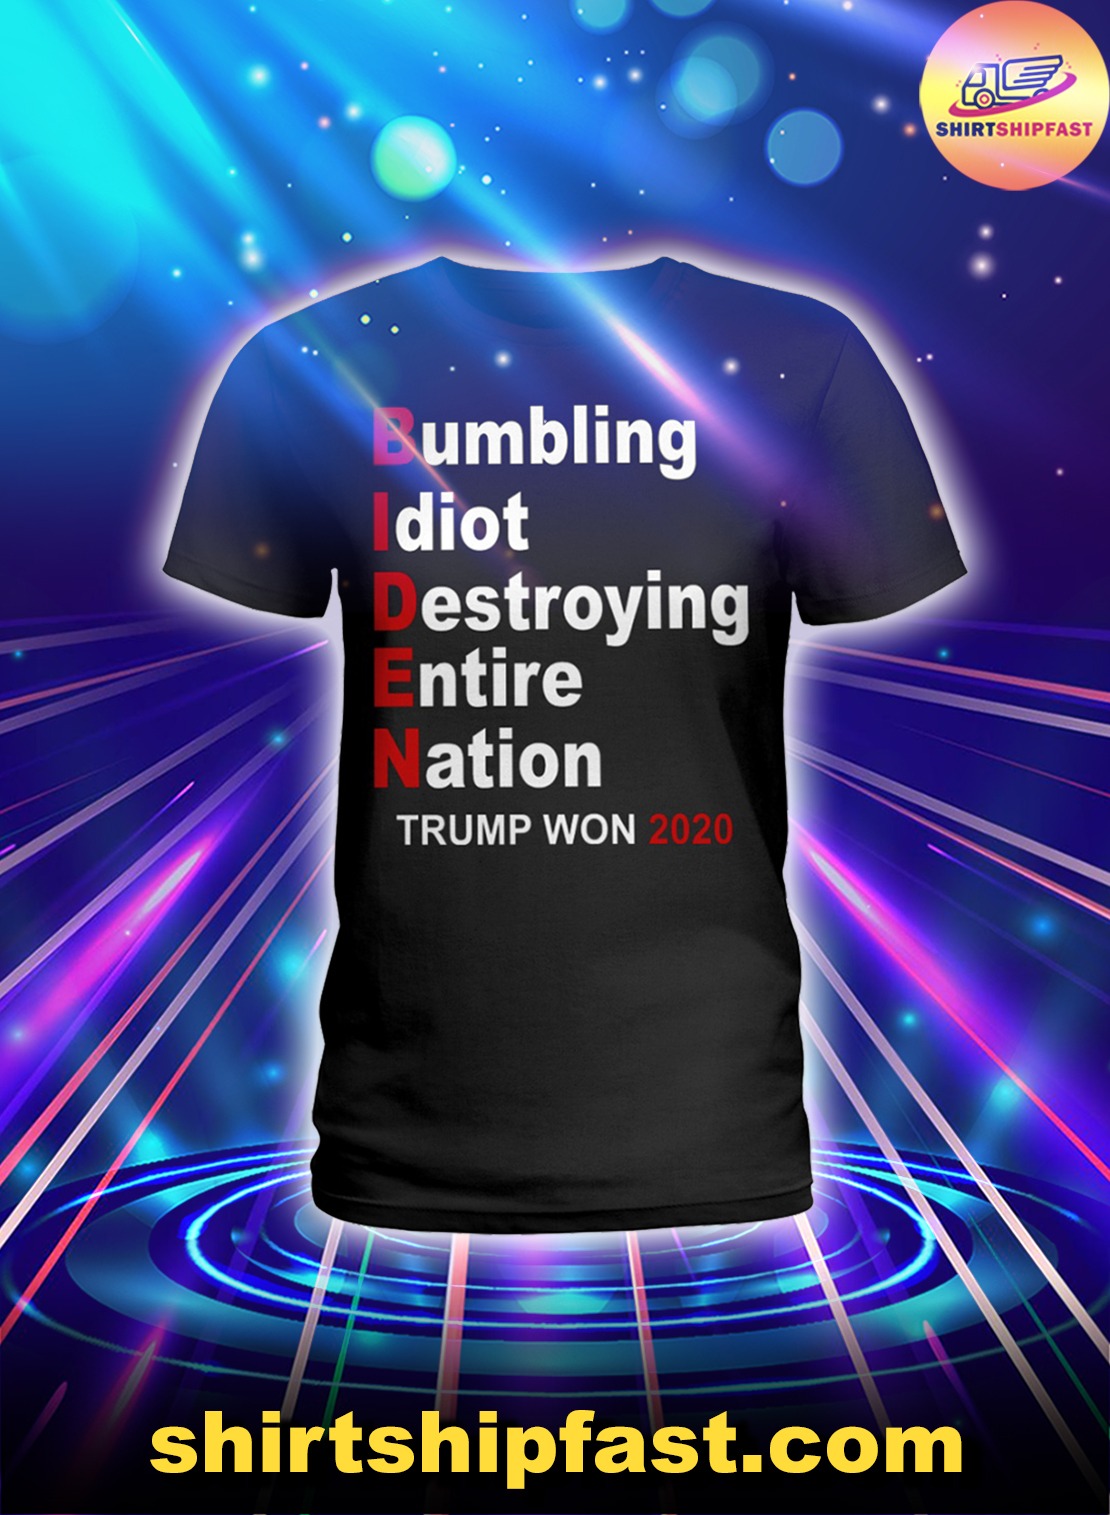 Biden bumbling idiot destroying entire nation Trump won 2020 shirt and sweatshirt